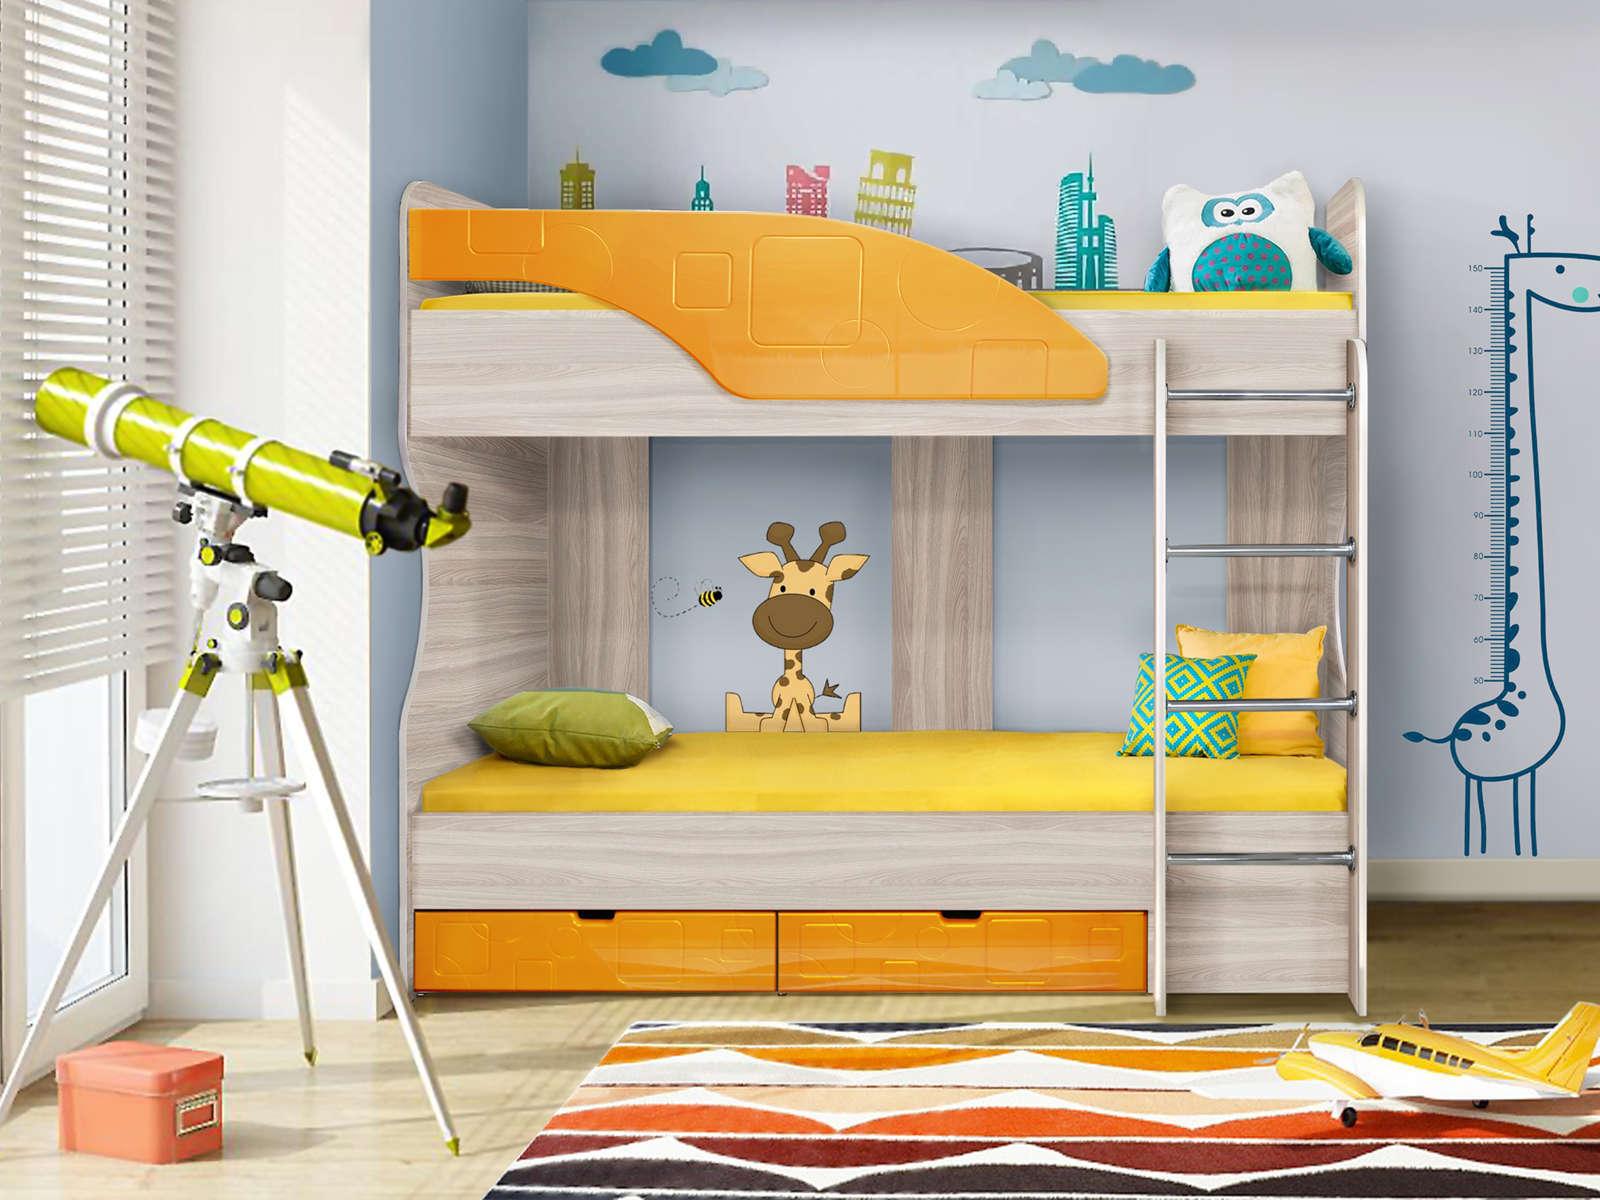 Кровать Бриз 5 (80х190) Манго квадрат, Оранжевый, Бежевый, МДФ, ЛДСП